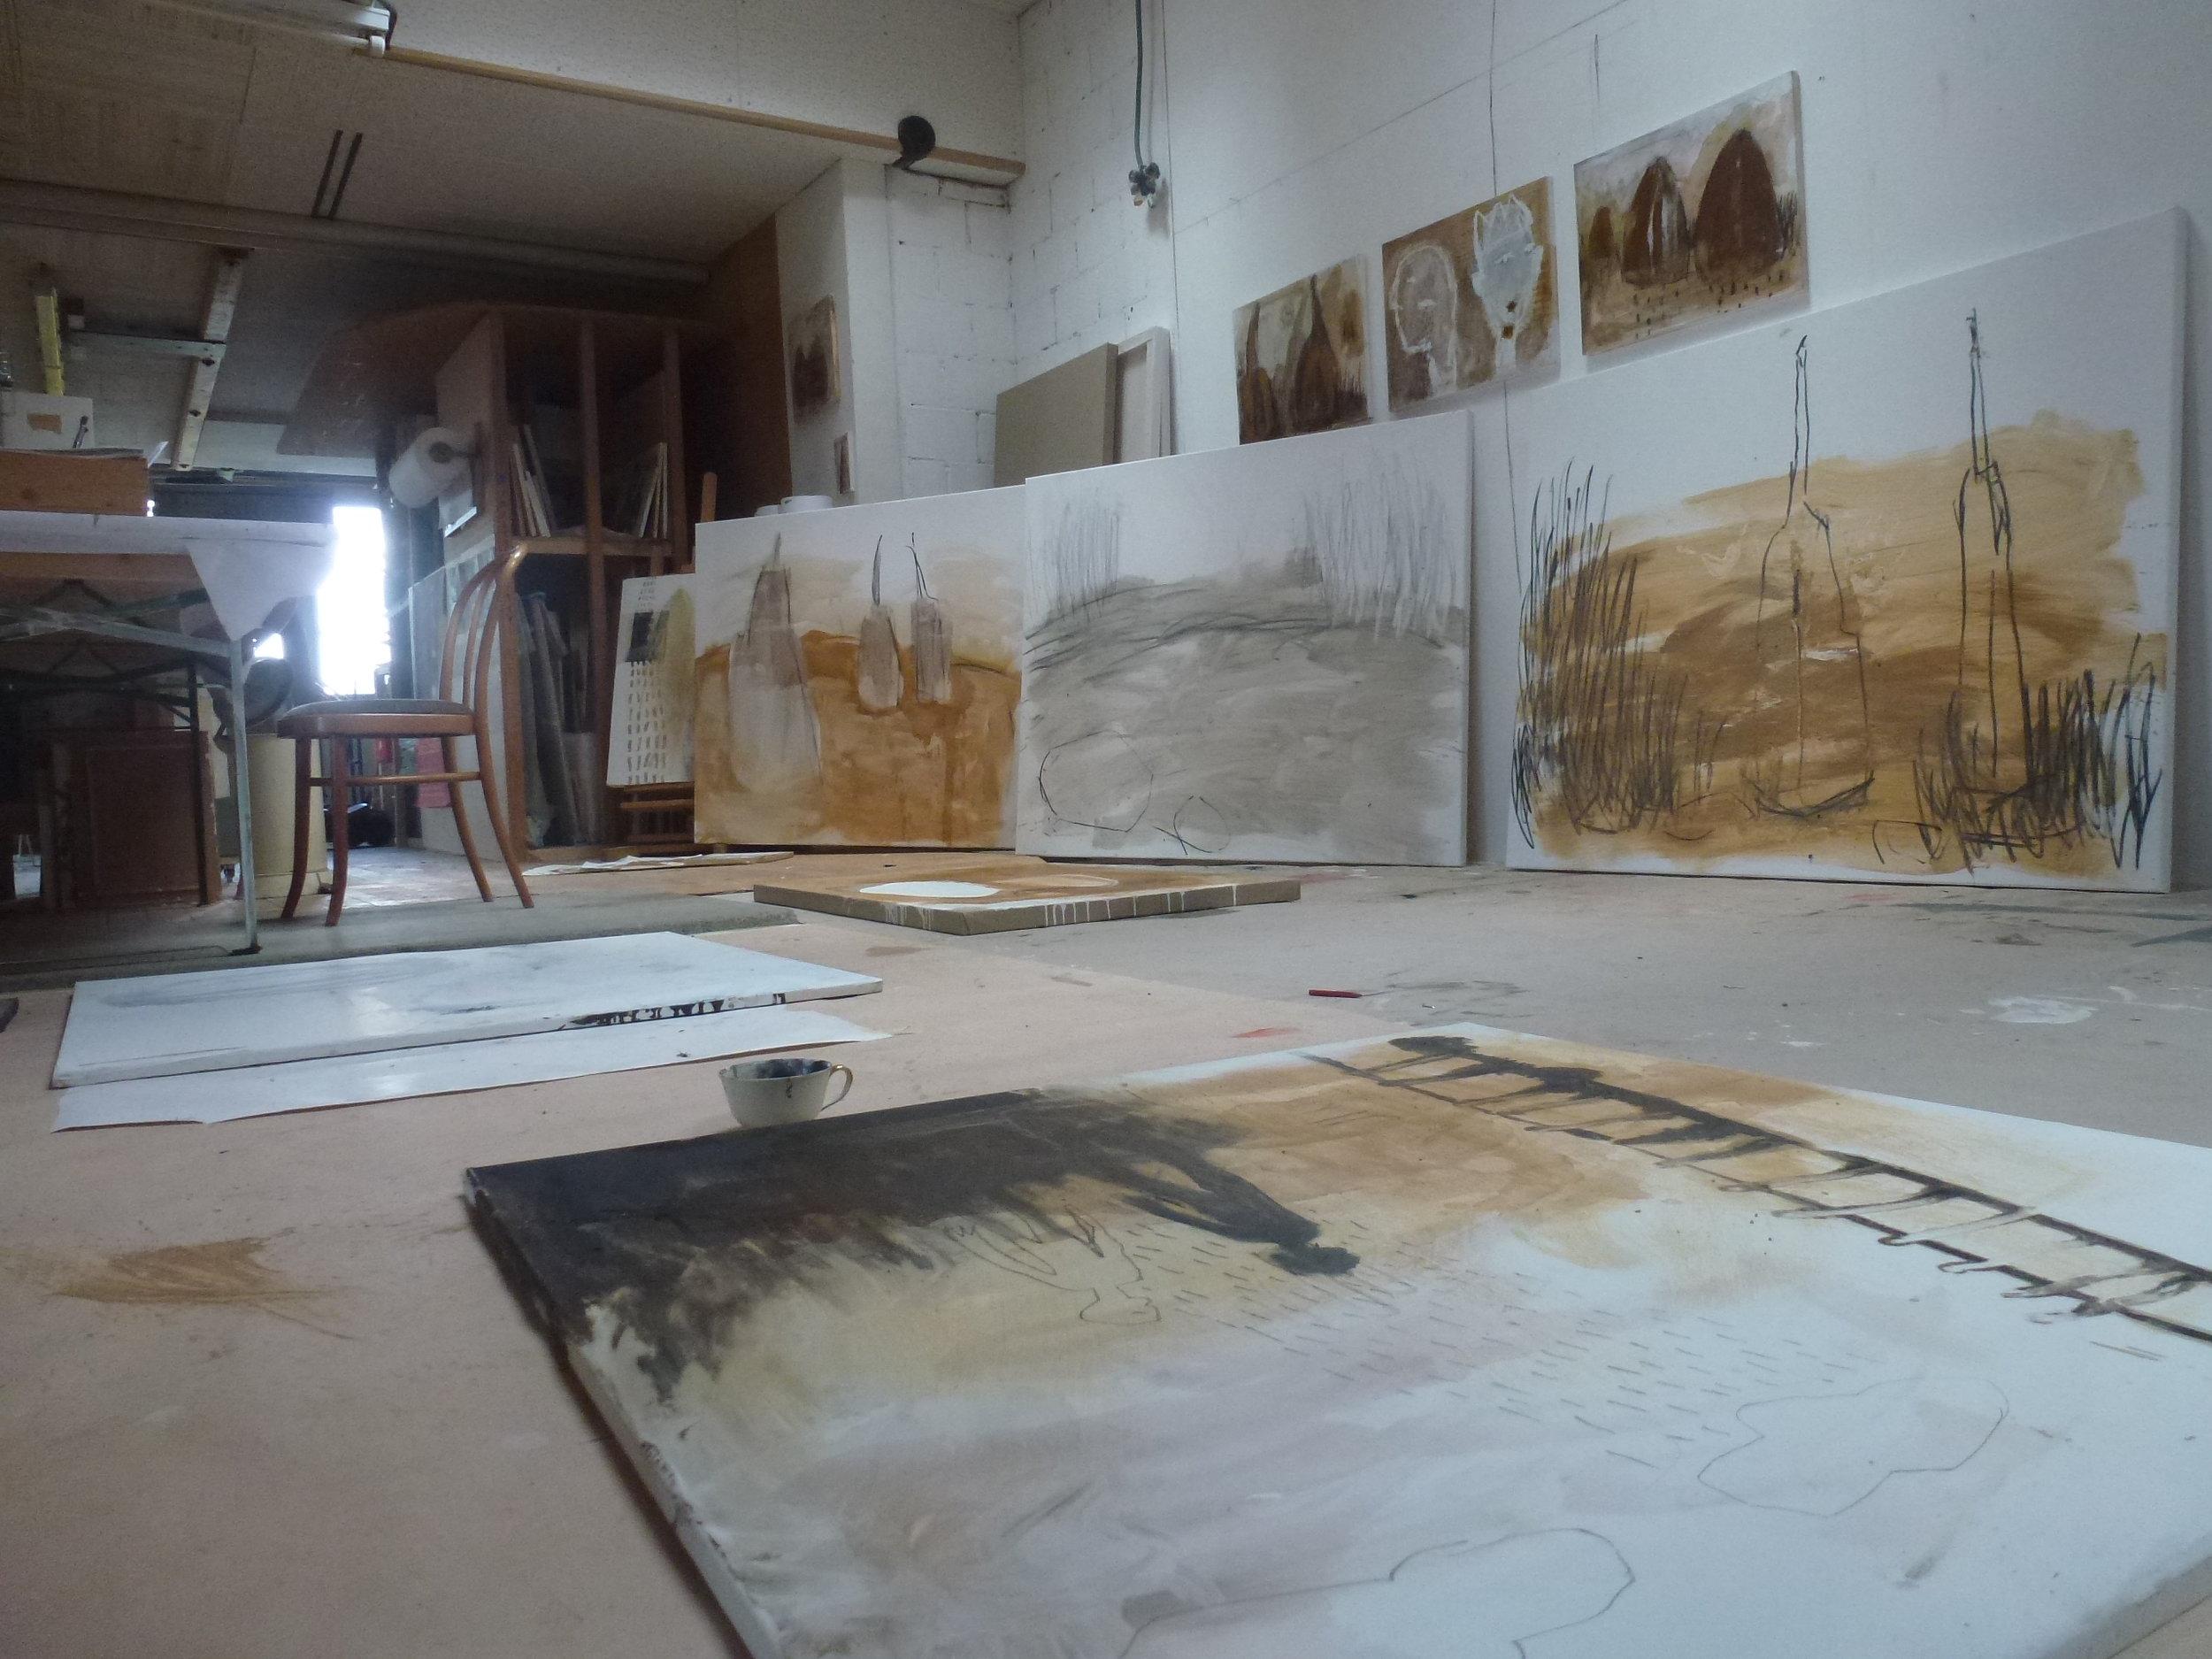 zuzak_2015-07-09_13-11-52_13.Atelier in Bickwil 2015.JPG